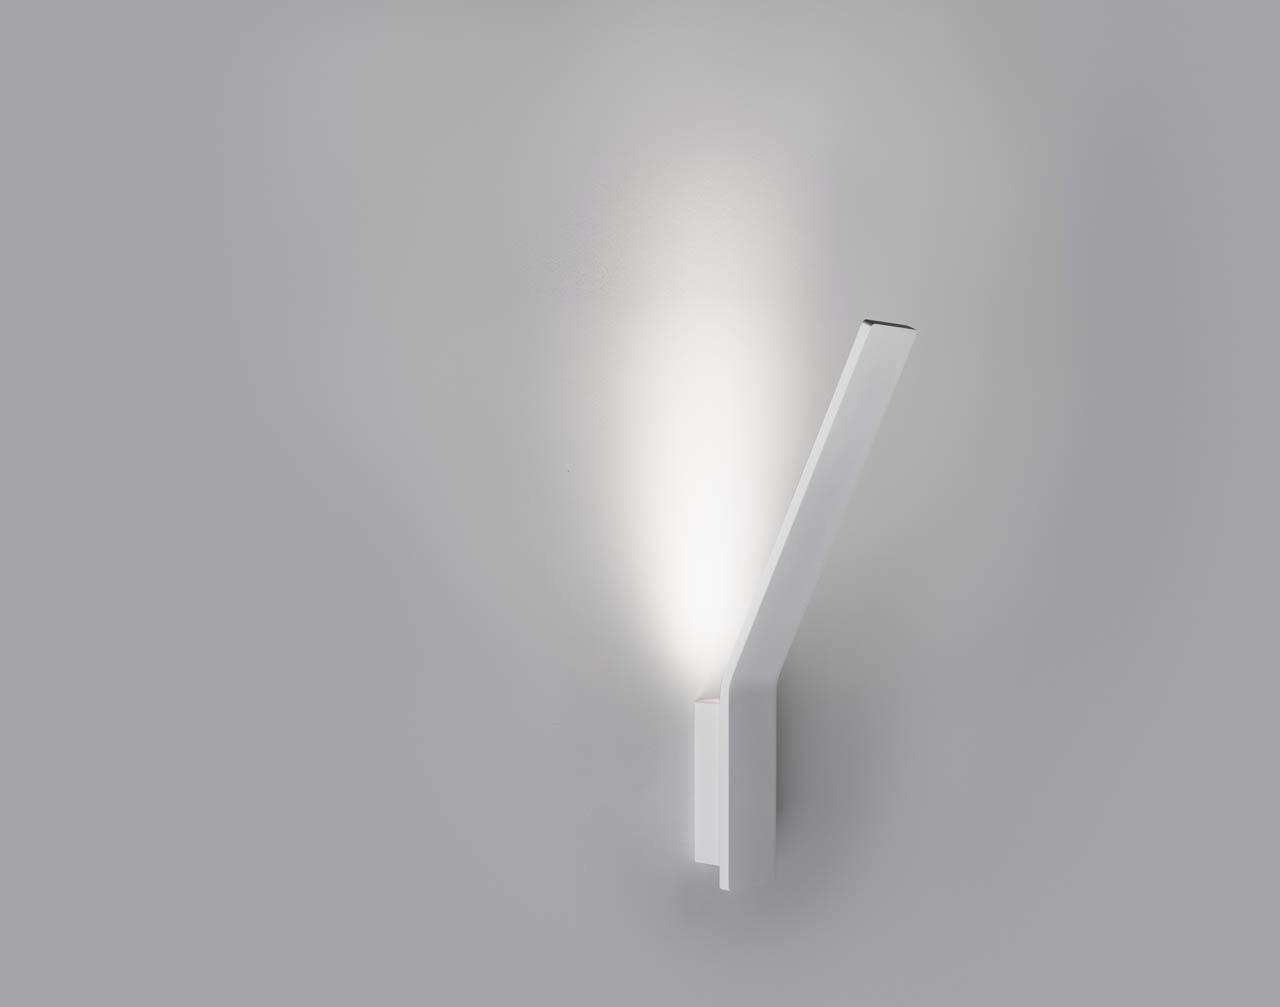 Plafoniere Da Parete A Led : Lama lampada da parete a led di linea light pianeta luce